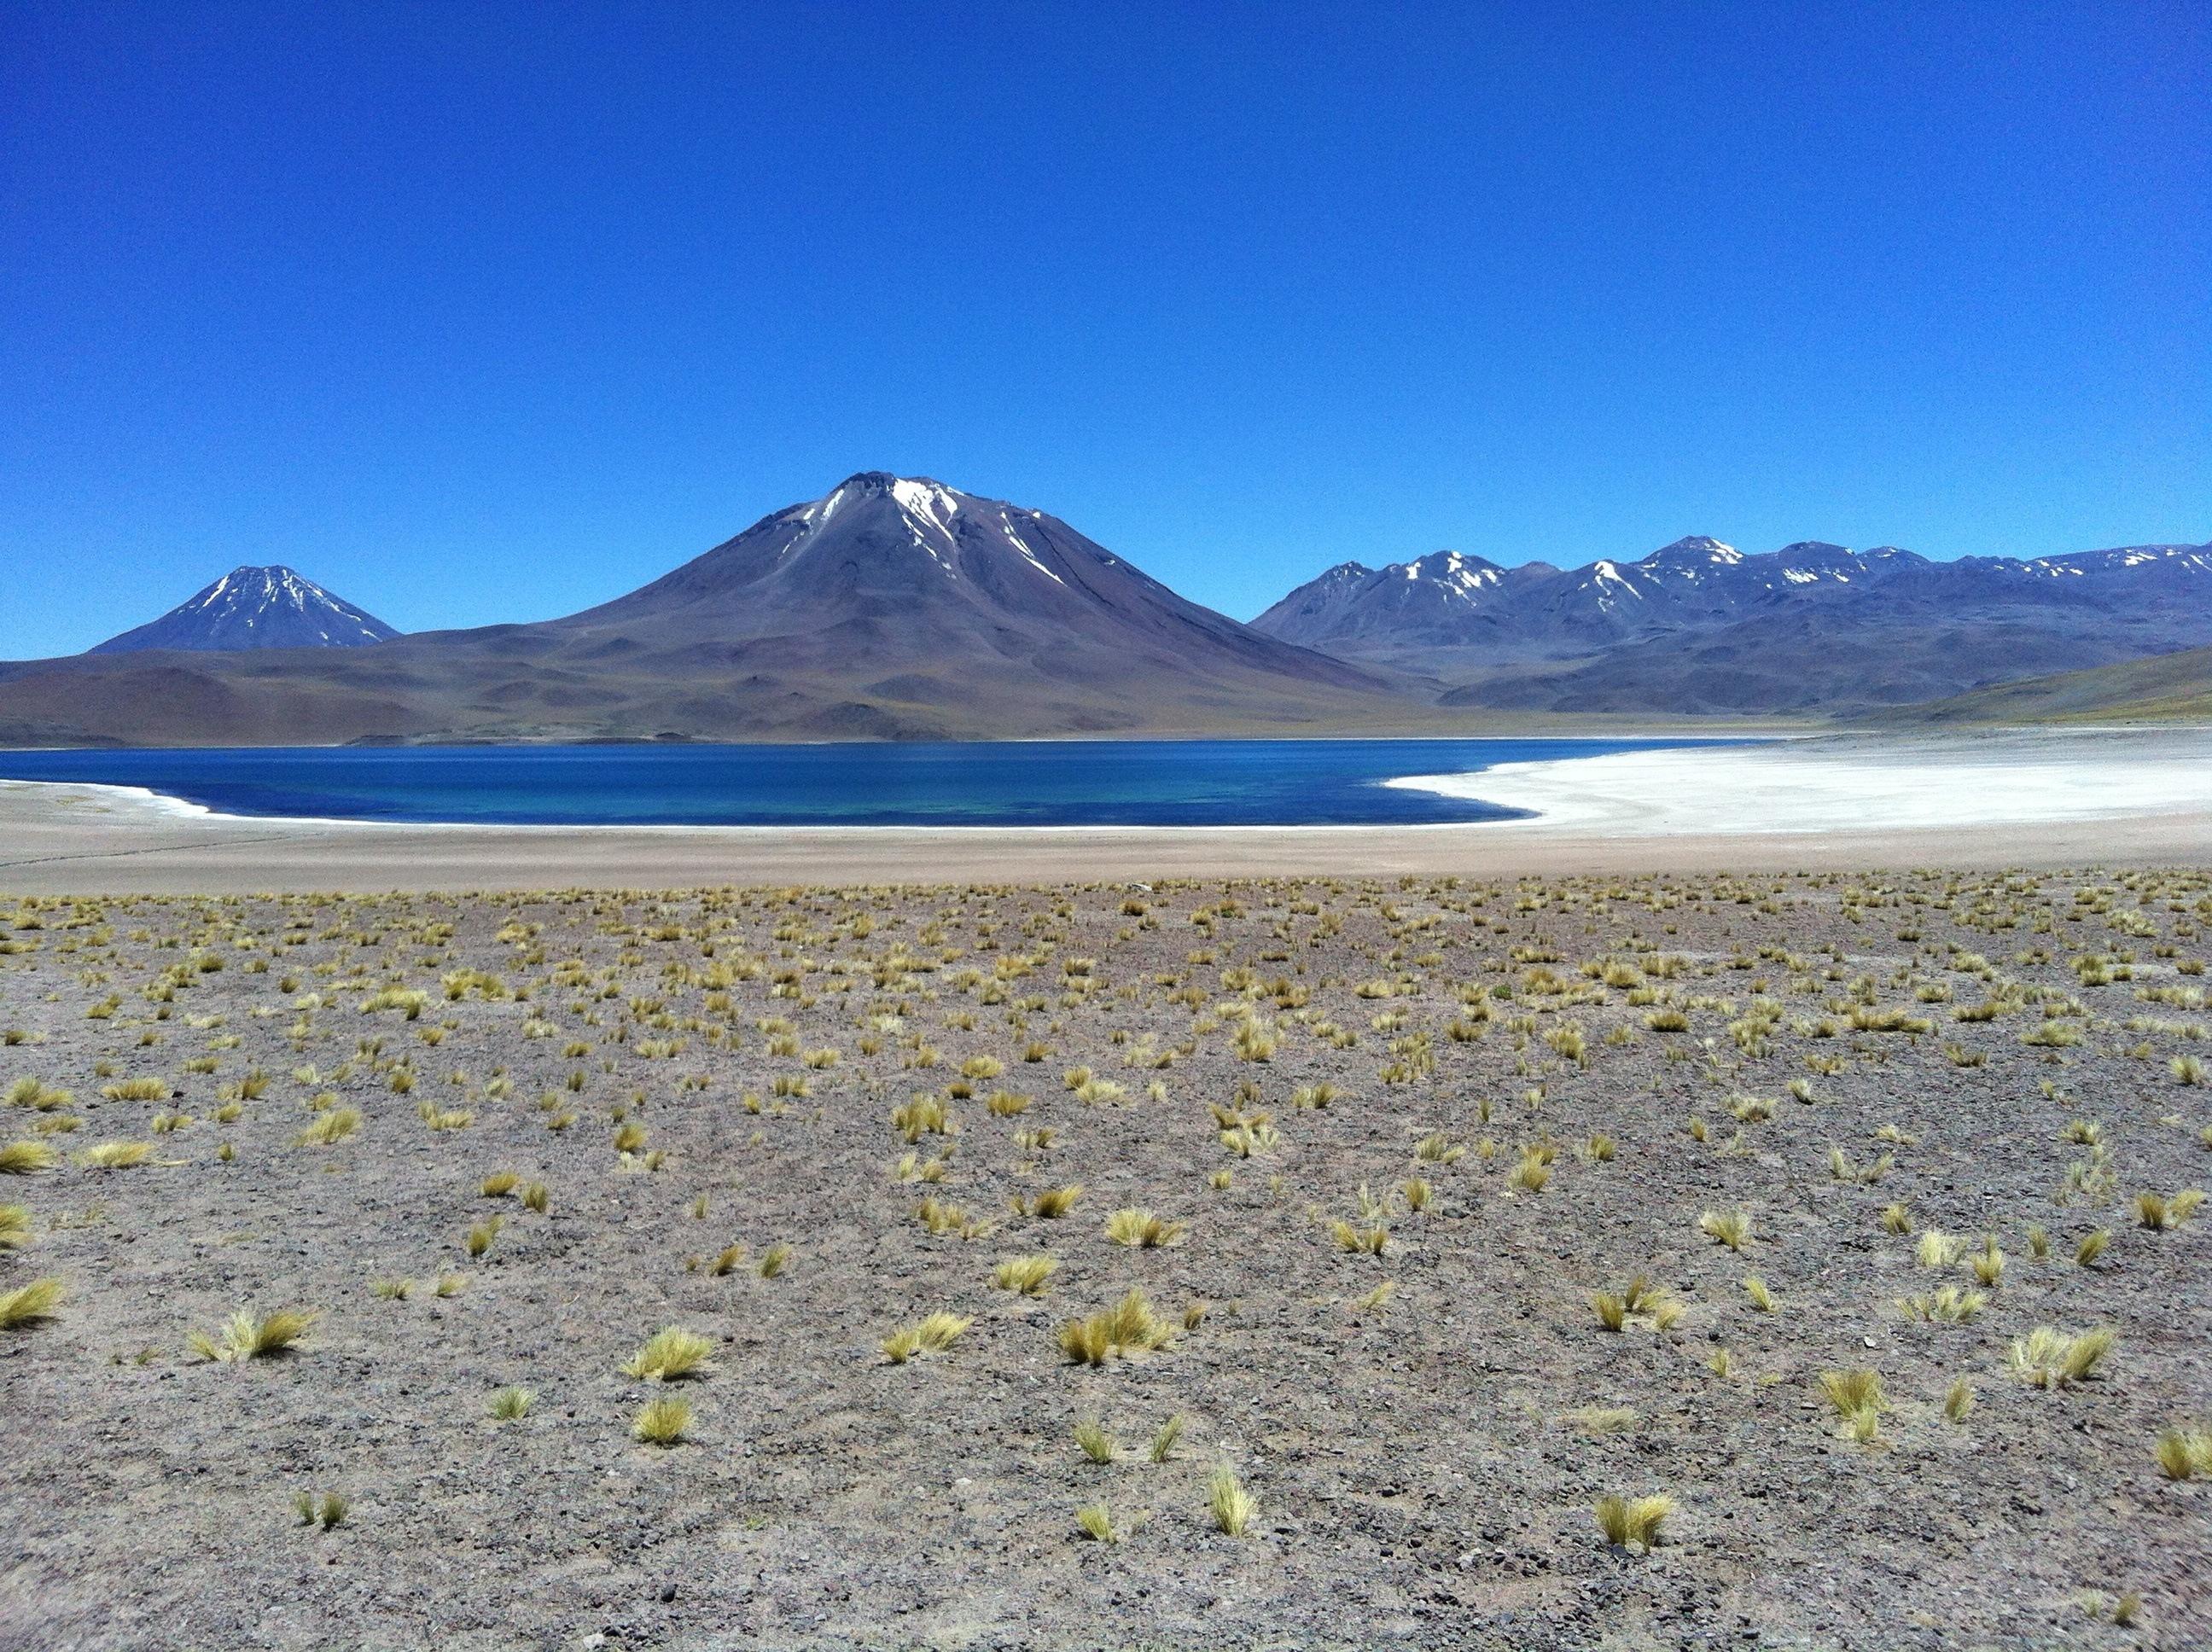 patagonia_ujrw3_T0